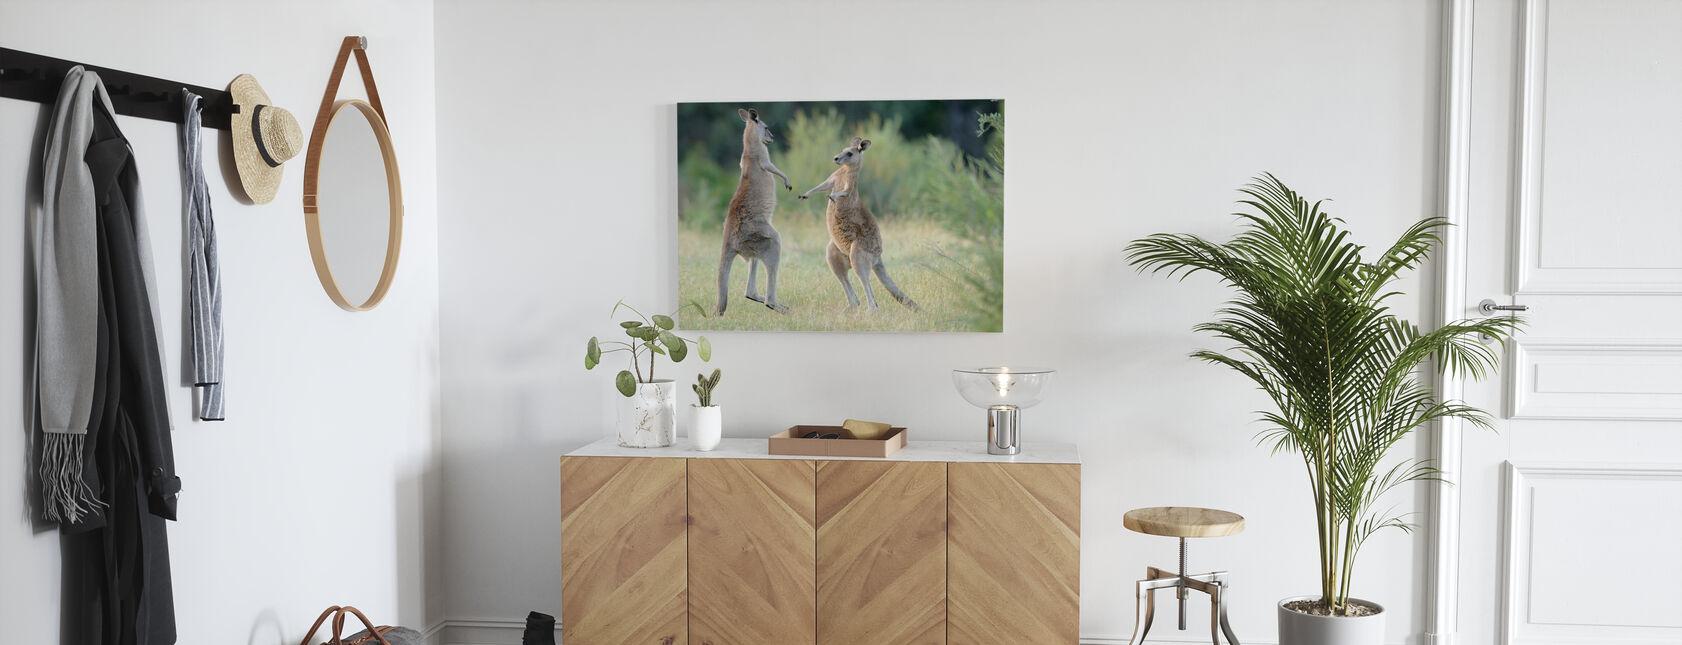 Oost-Grijze Kangoeroe - Canvas print - Gang